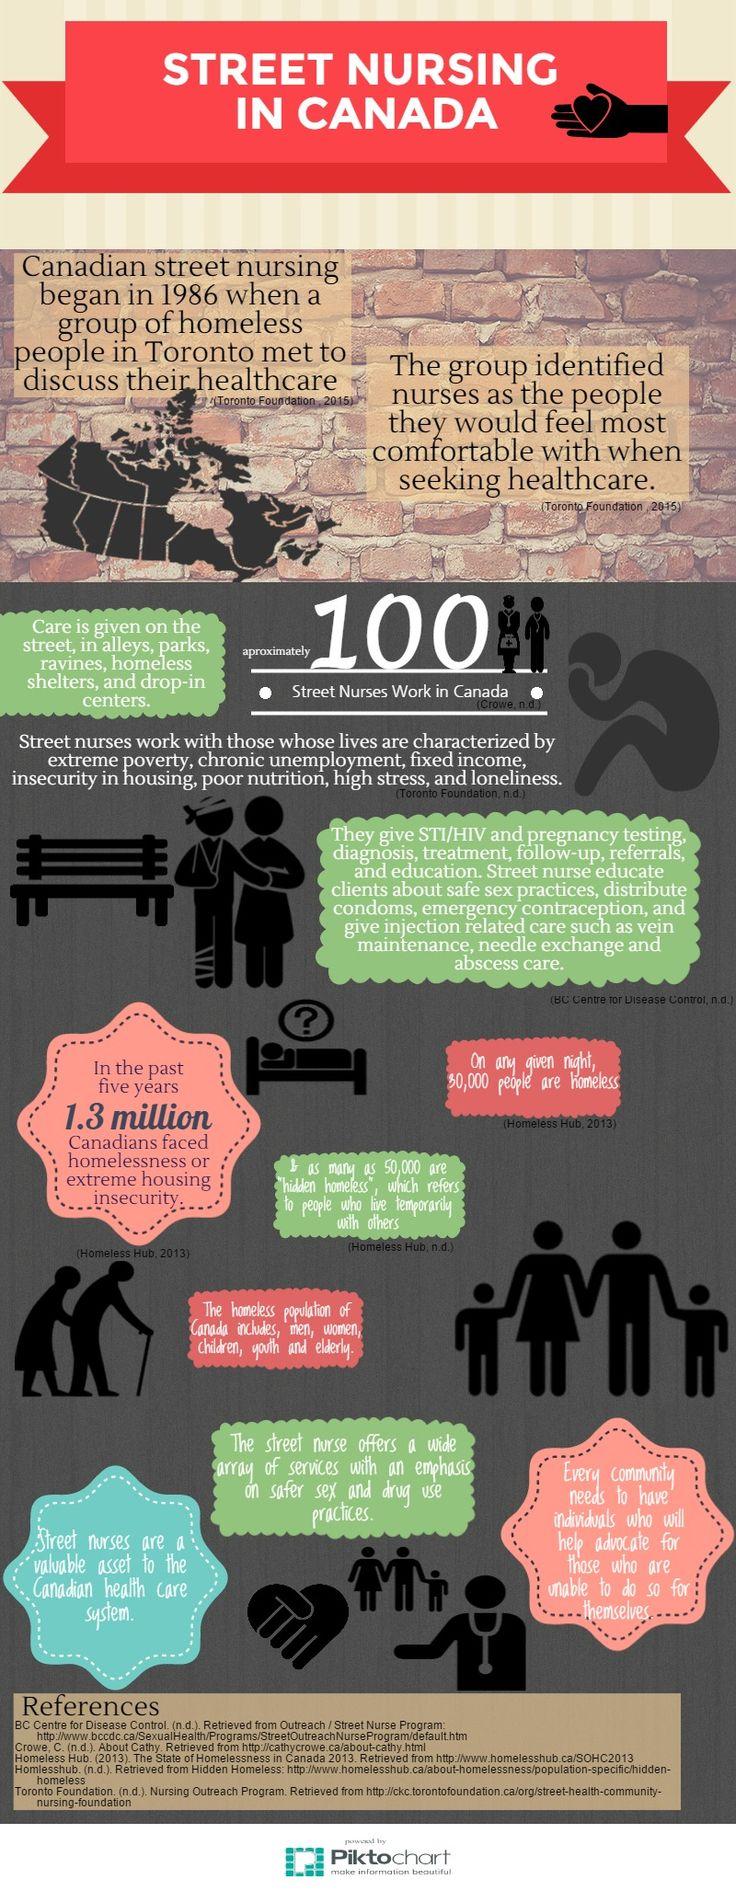 Street Nursing in Canada   @Piktochart Infographic by kaiti stanton